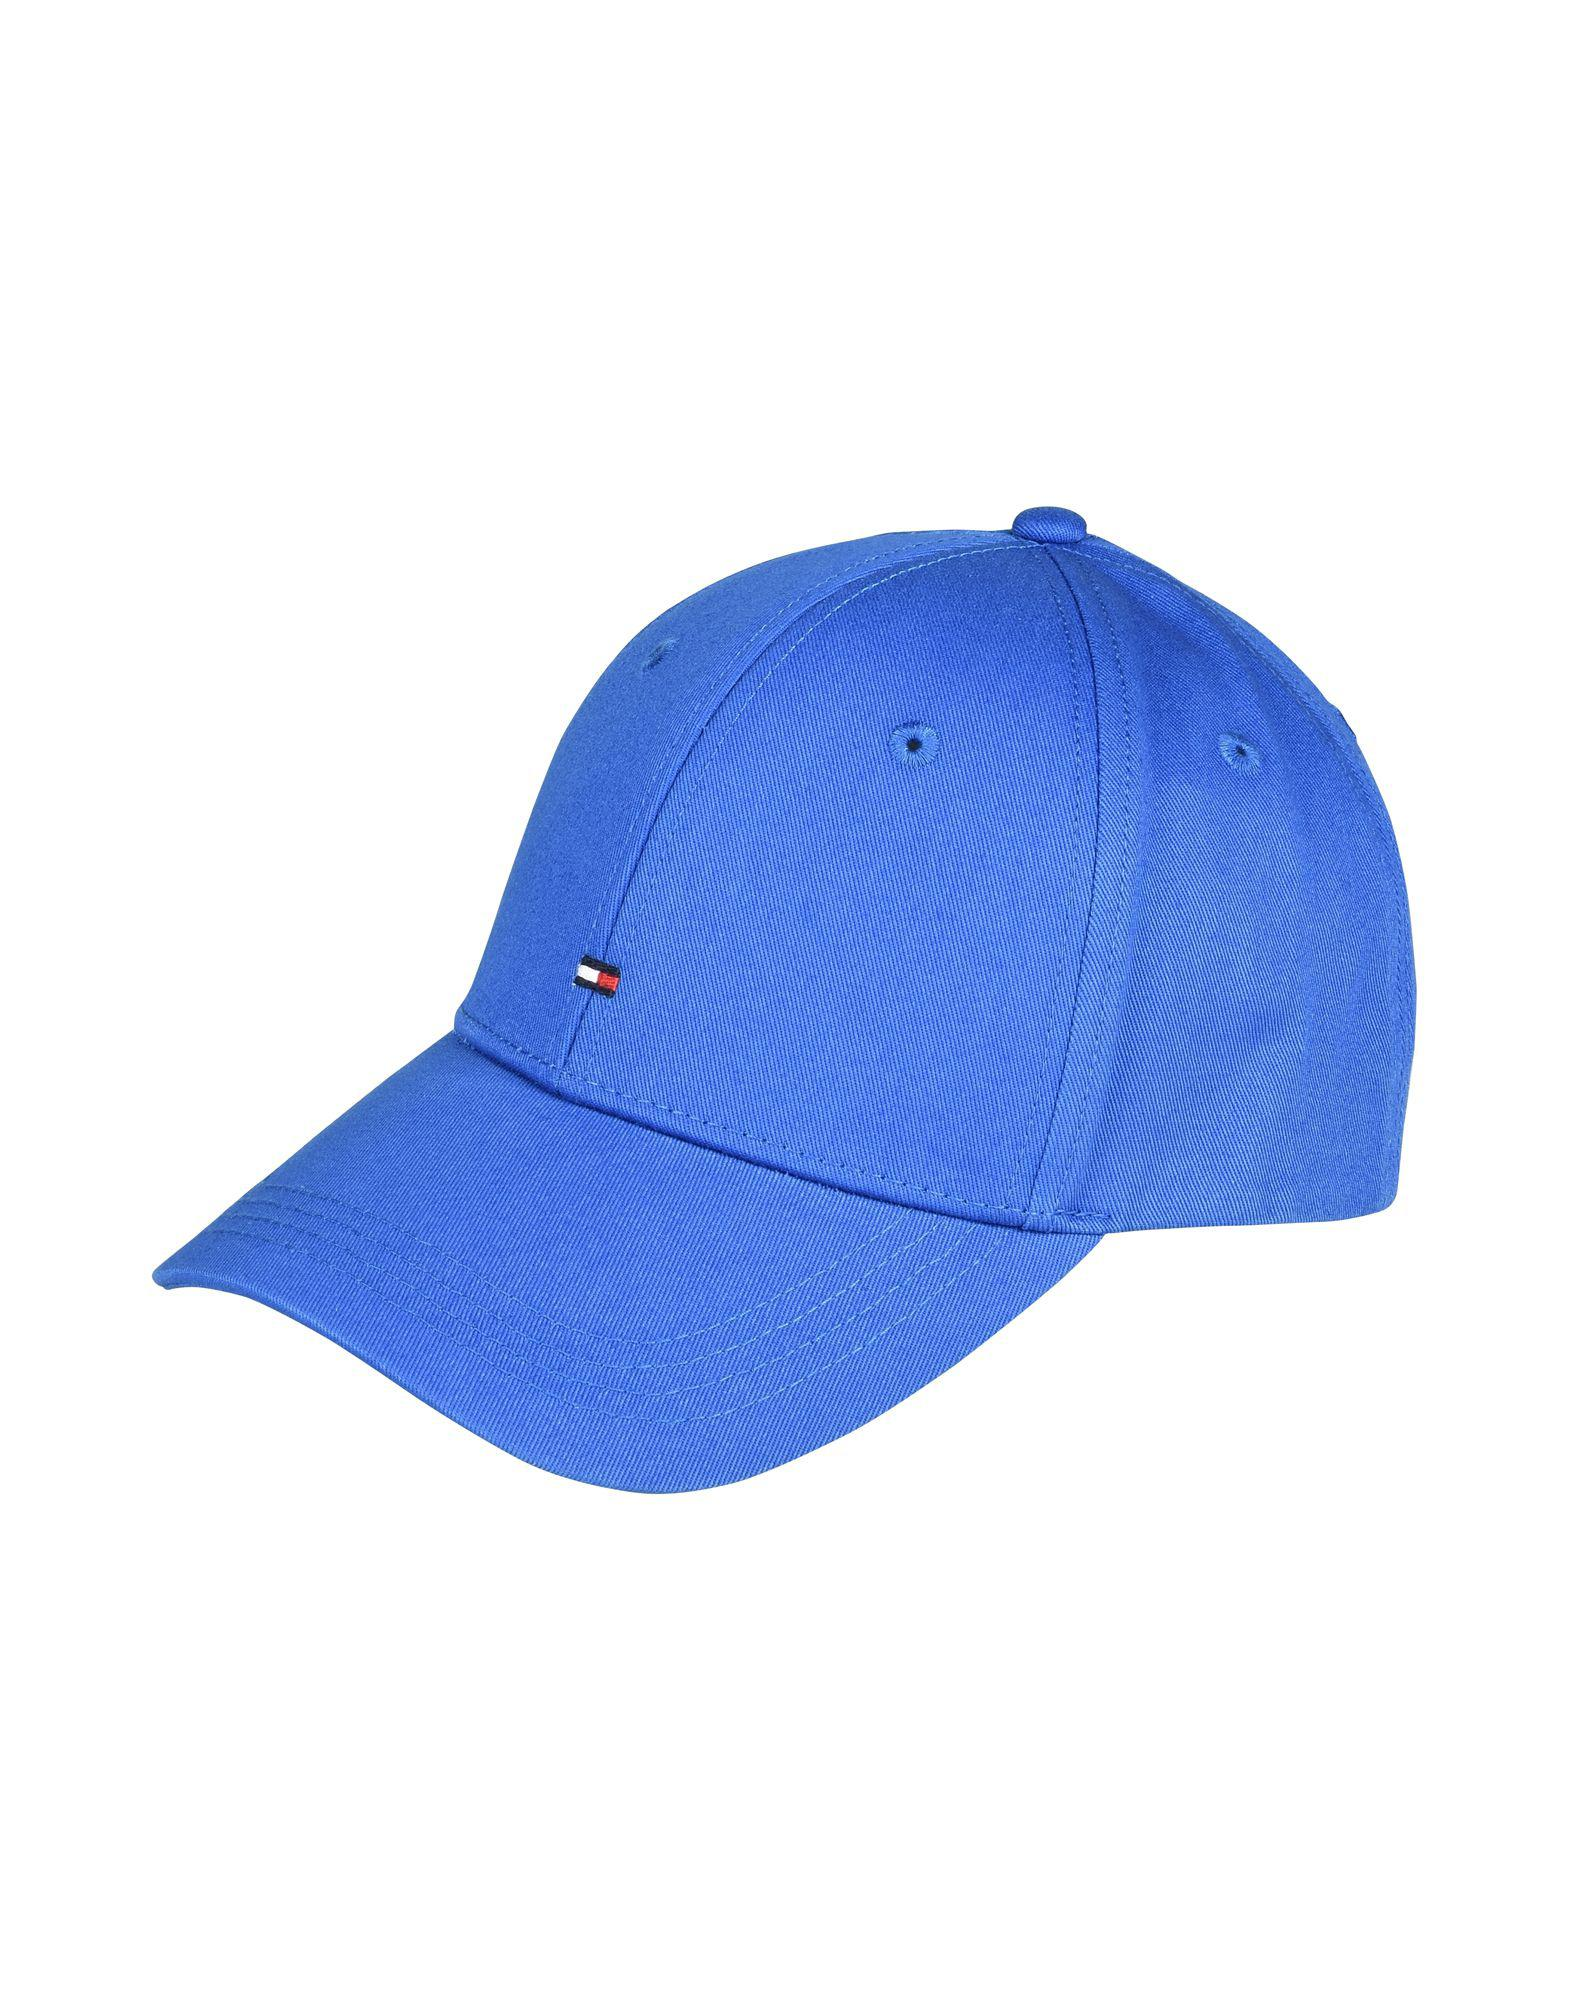 Tommy Hilfiger Hat in Blue for Men - Lyst 093782216cc